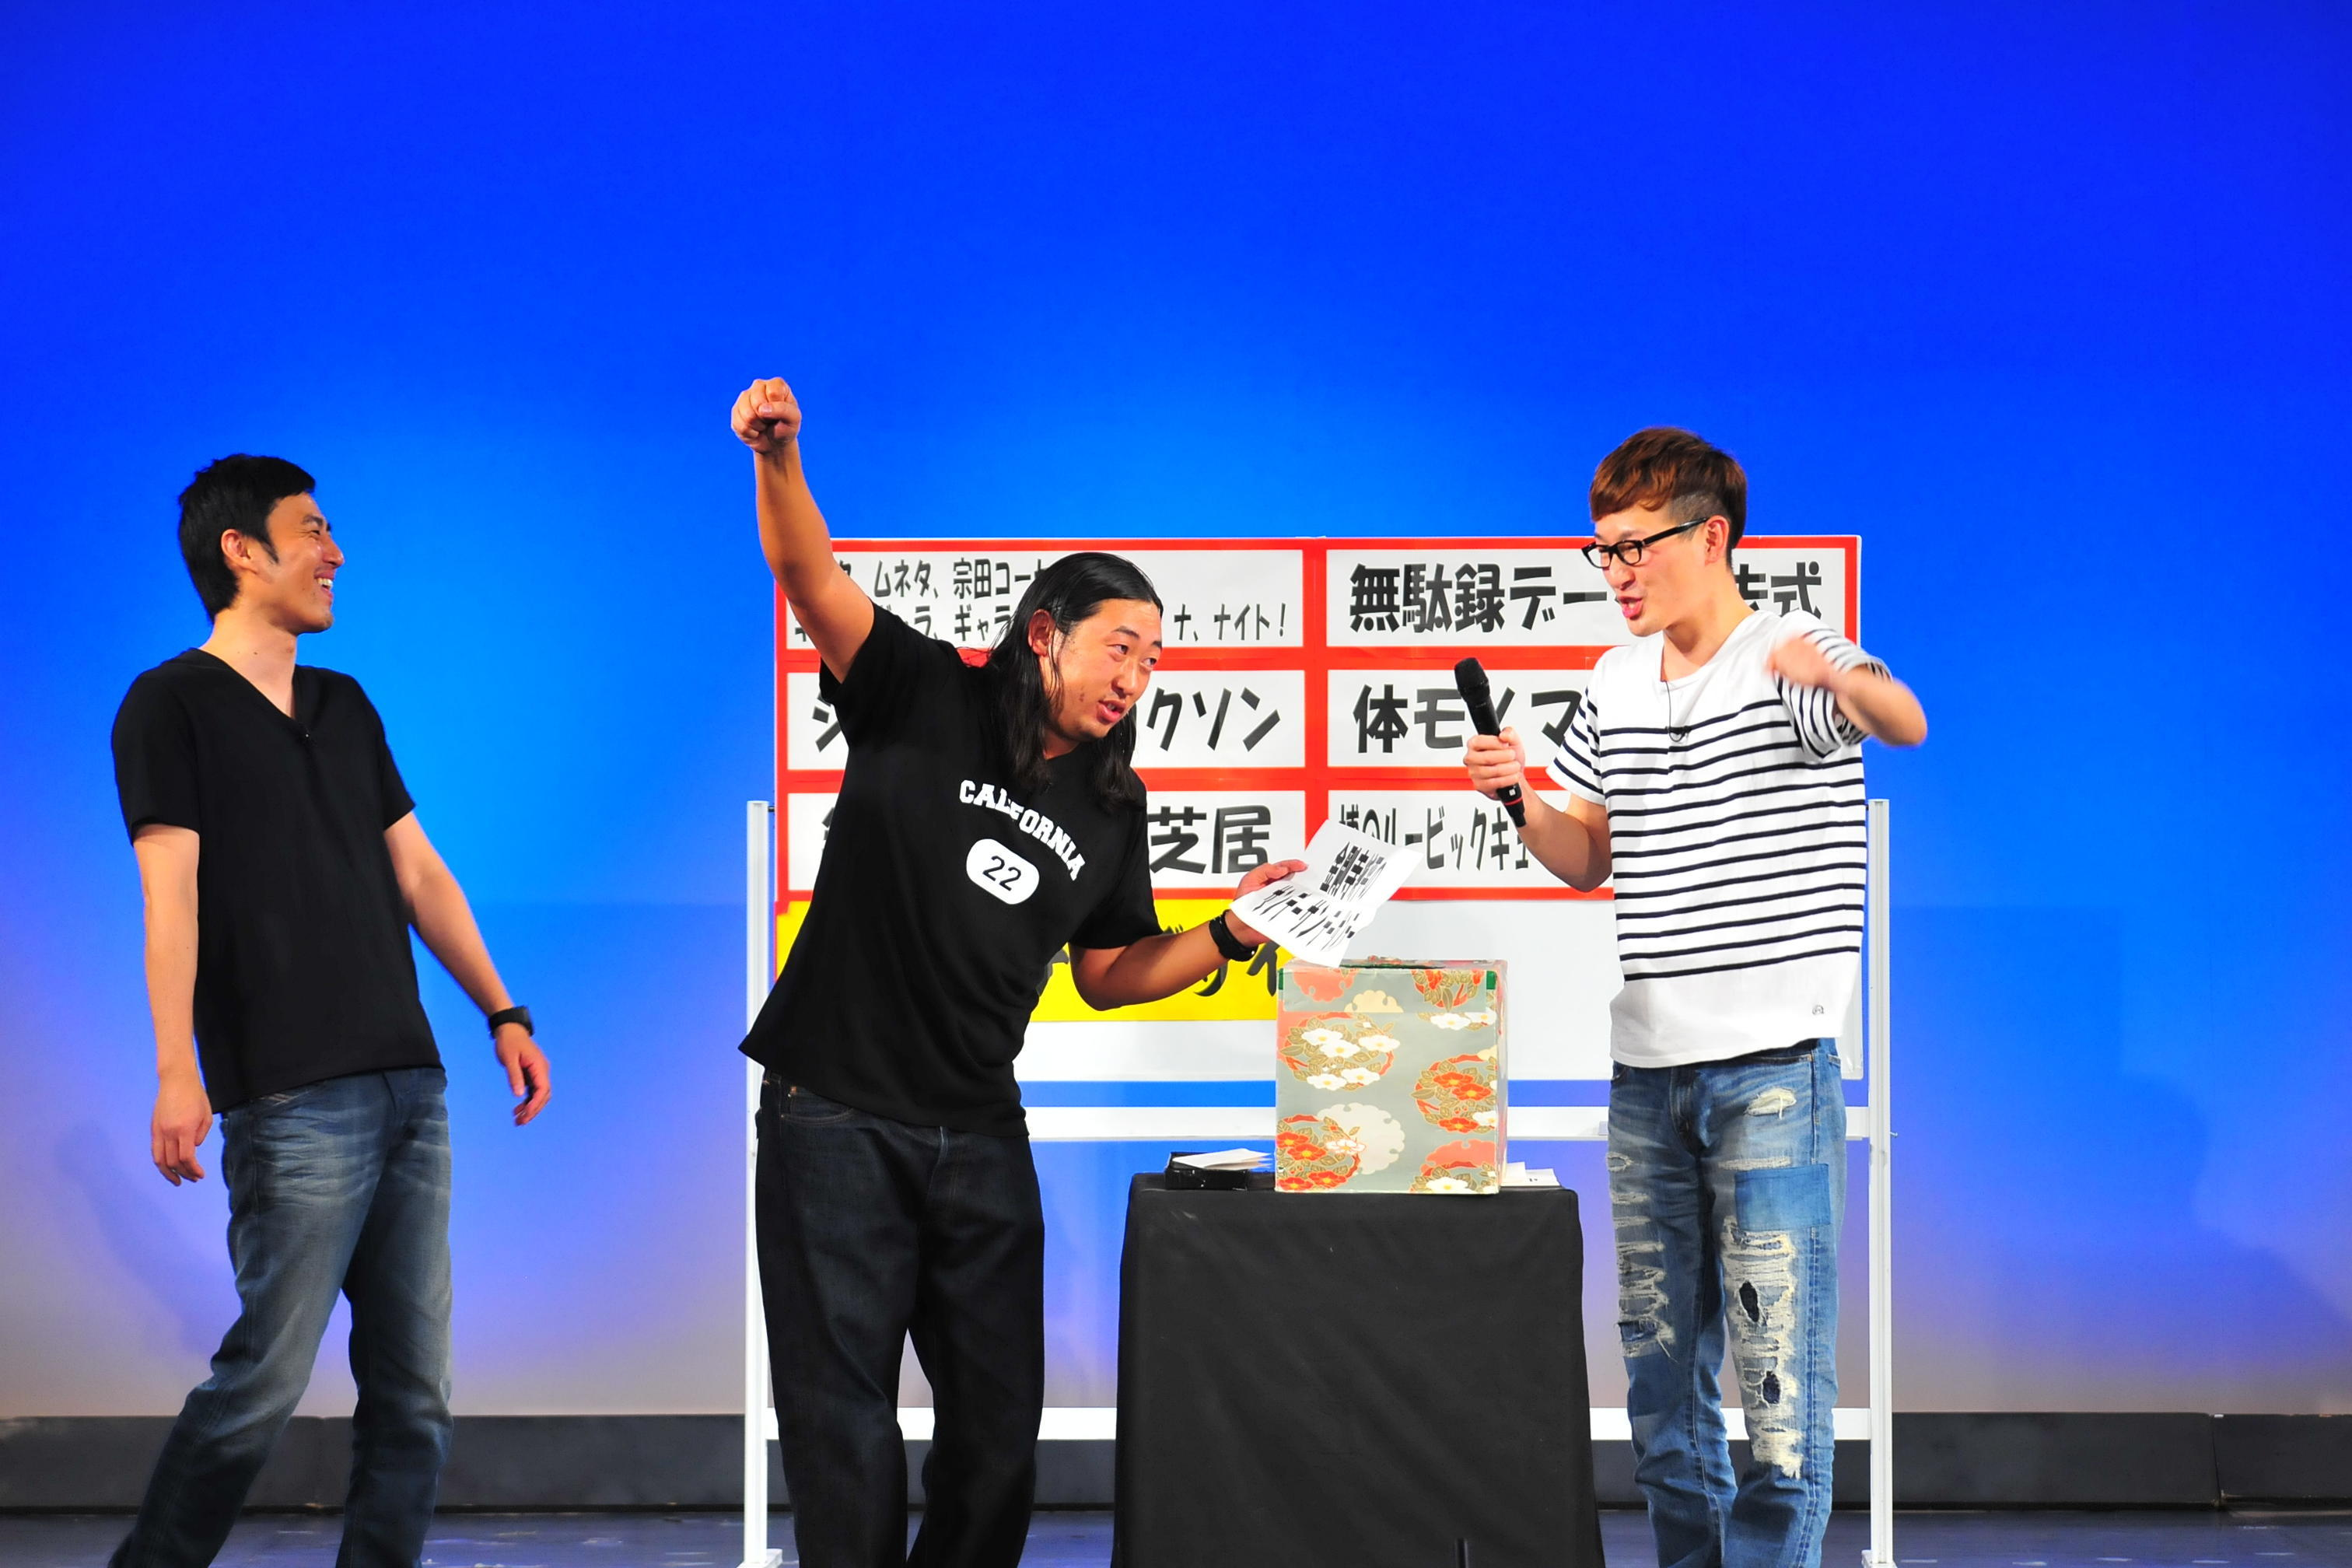 http://news.yoshimoto.co.jp/20160425154136-a68a276b83fe90789a7f7cb06847dc1a68d38de4.jpg